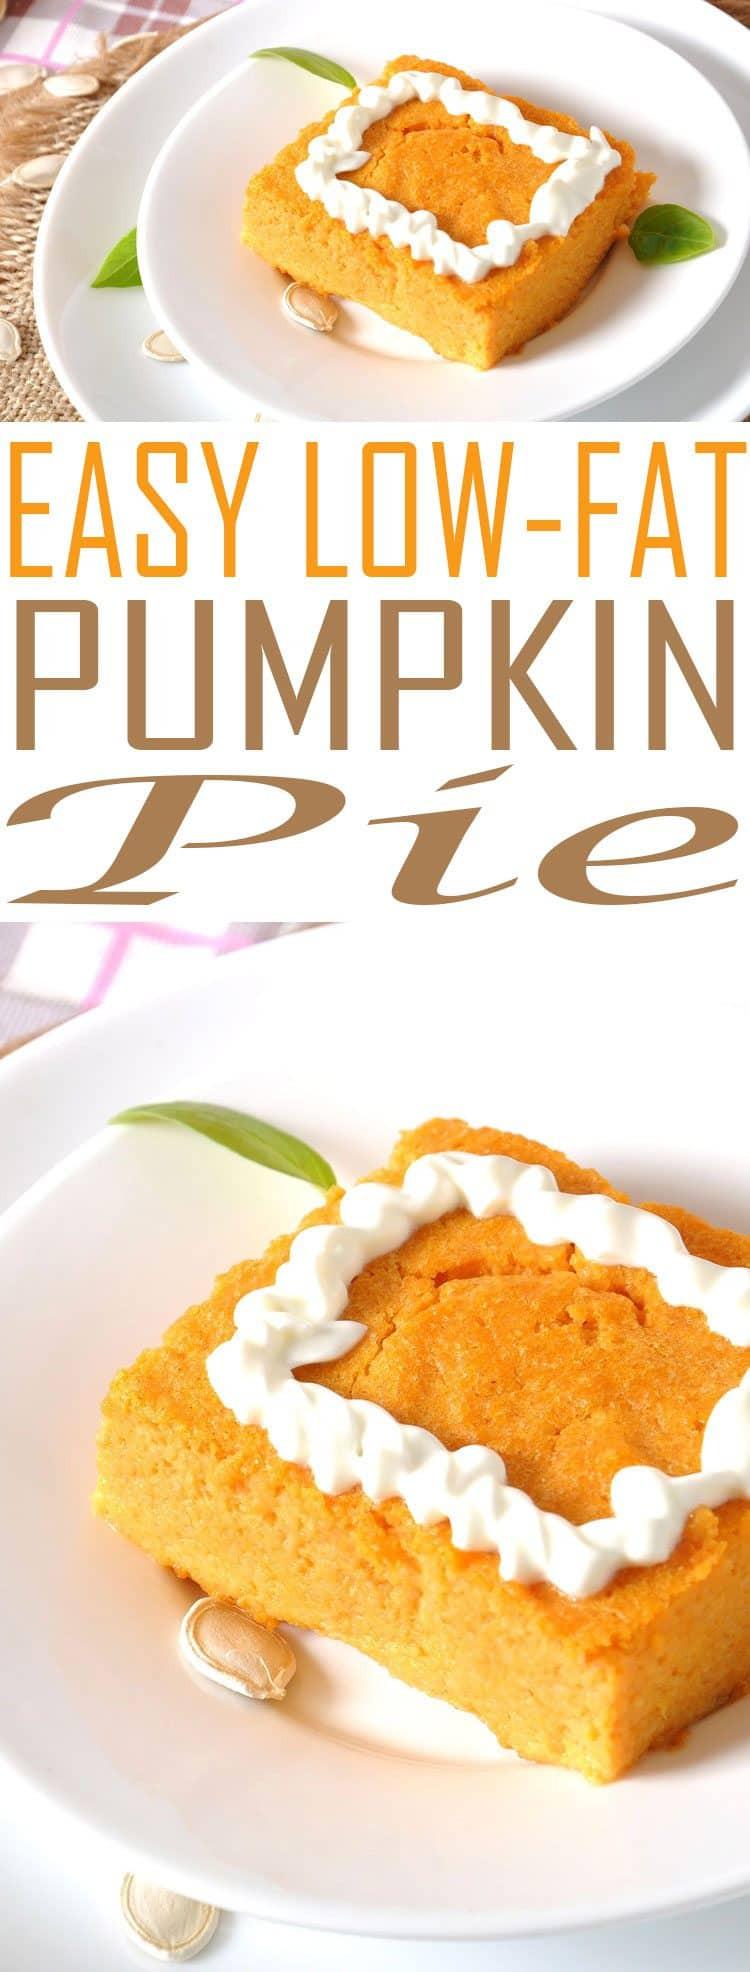 Low Fat Desserts Weight Watchers  Weight Watchers Pumpkin Pie Just 1 4 Smart Points Per